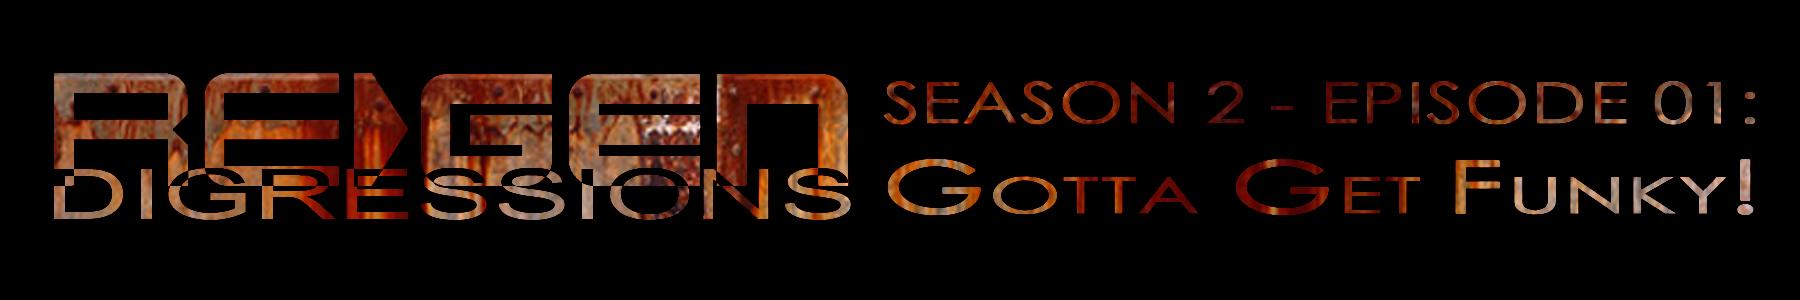 ReGen Digressions – Season 2_Episode 01: Gotta Get Funky!